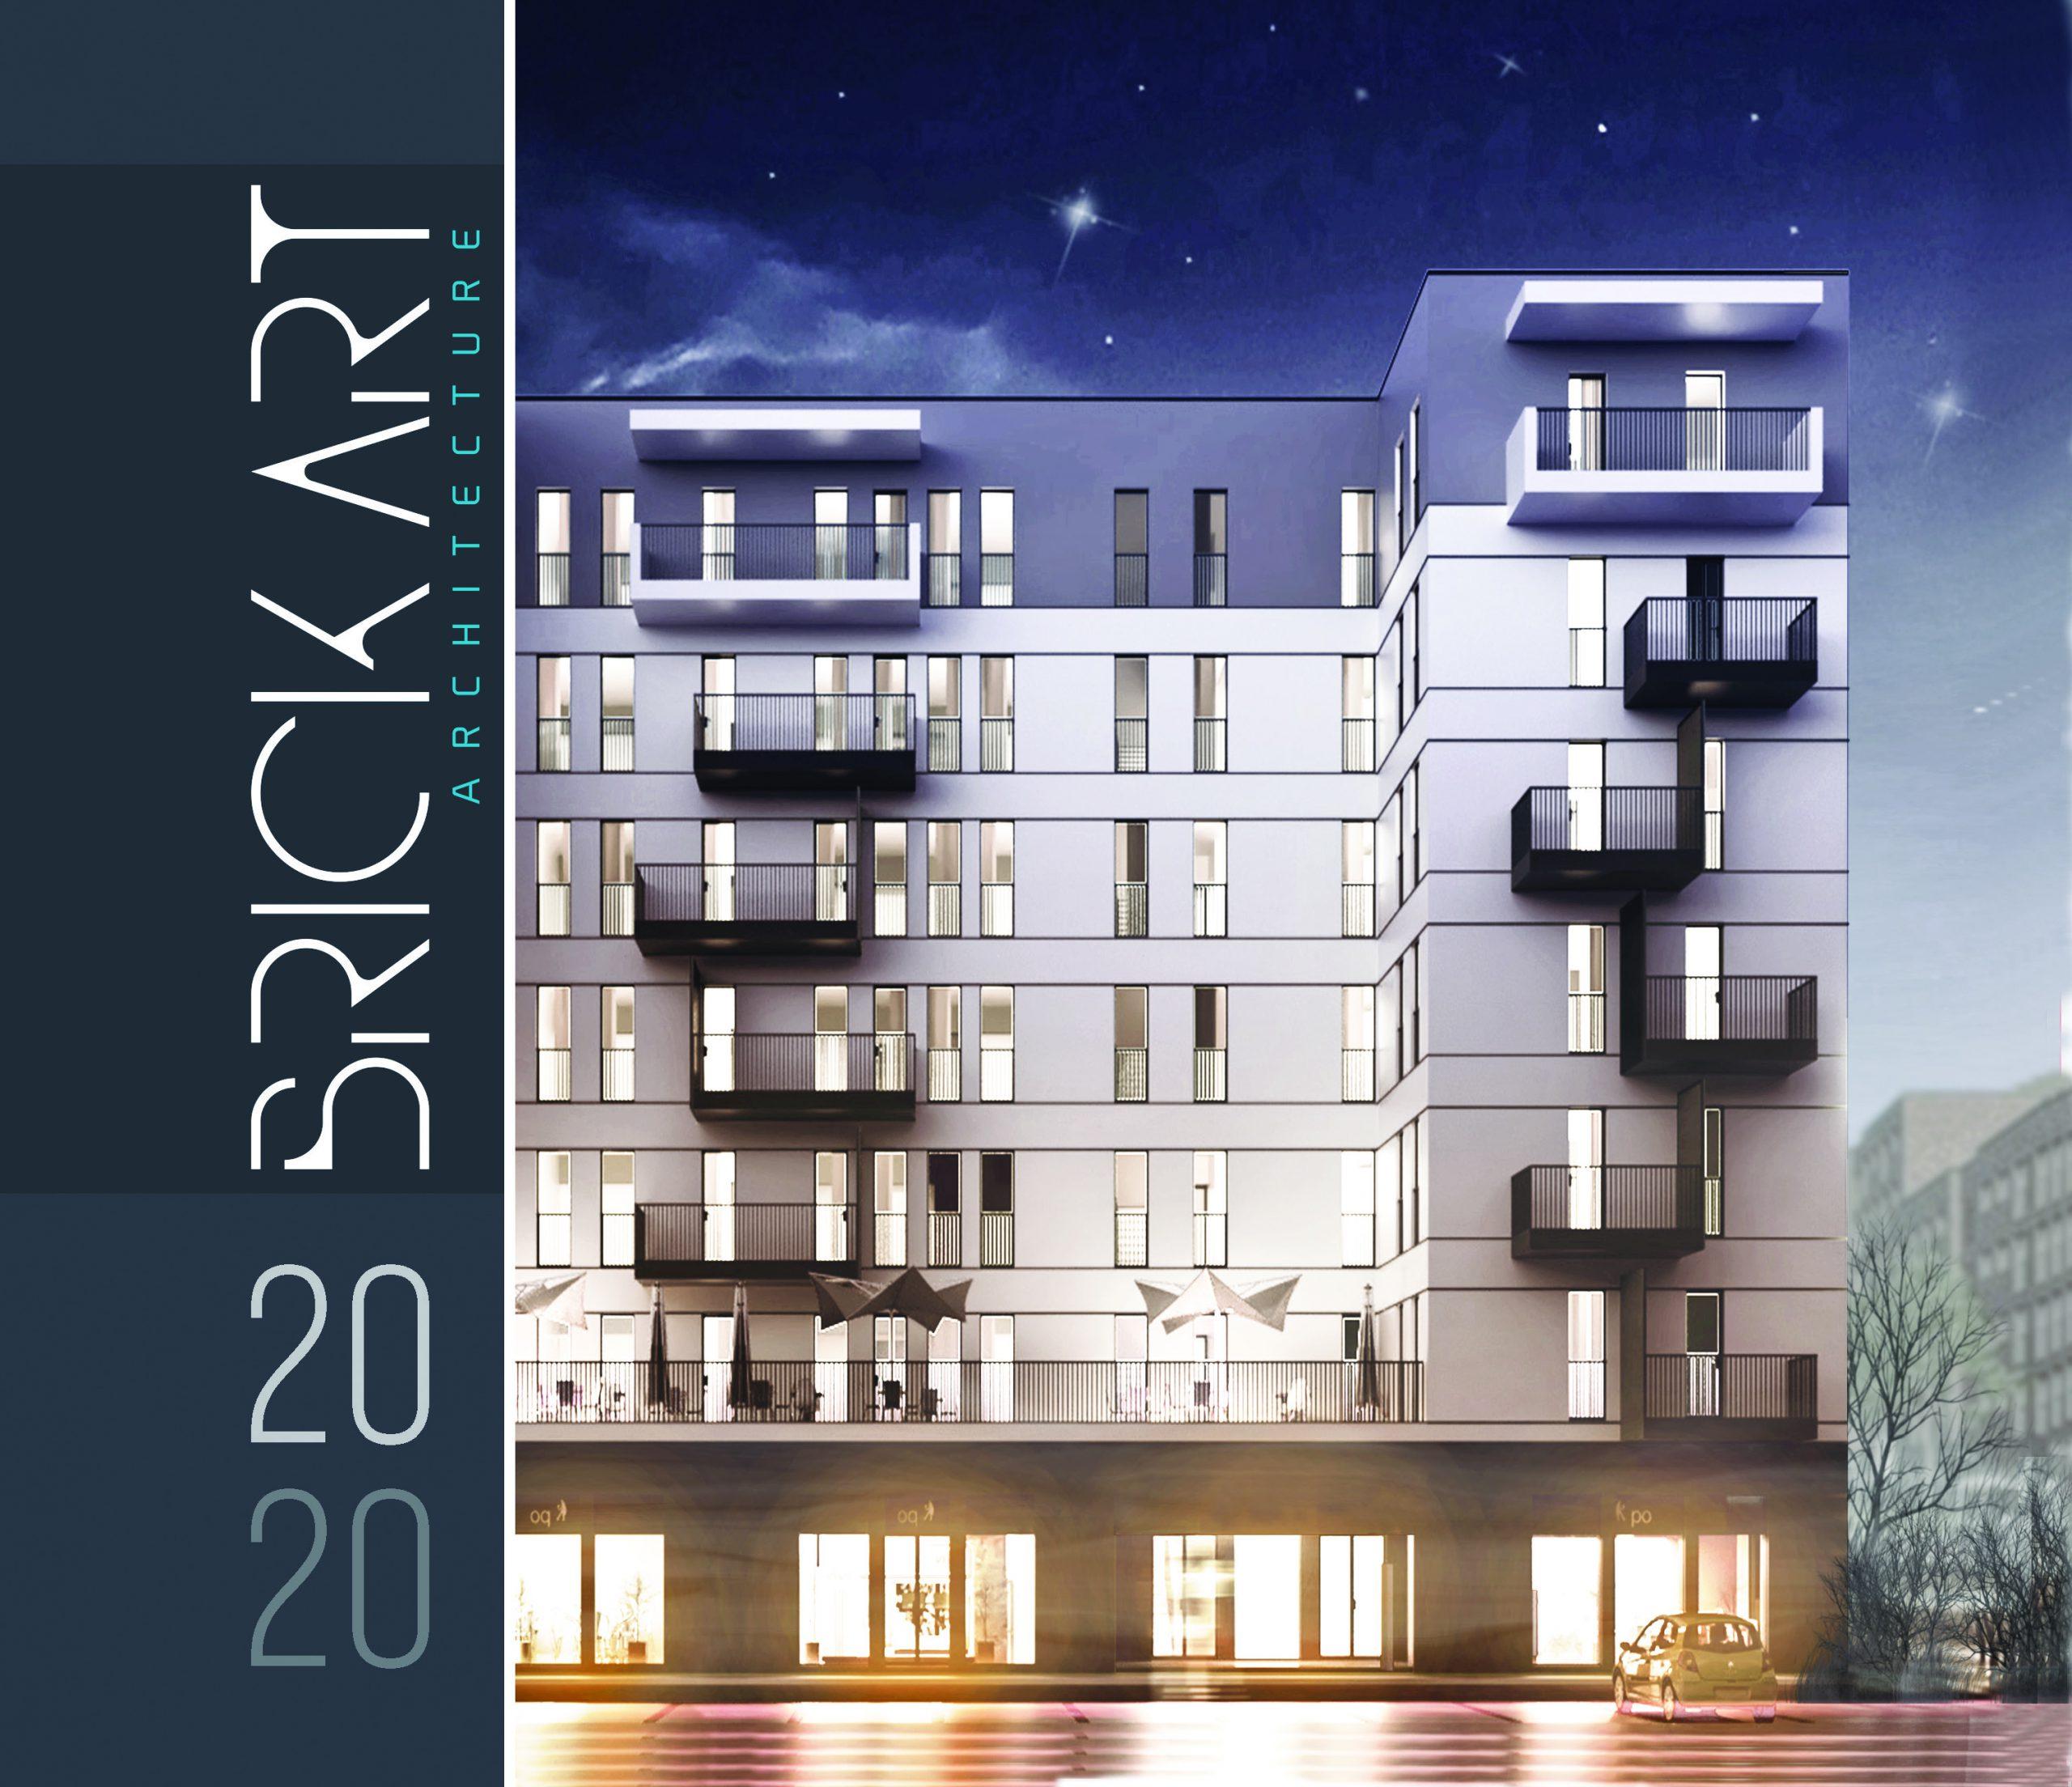 https://issuu.com/brickart/docs/brick_art_-_selected_works